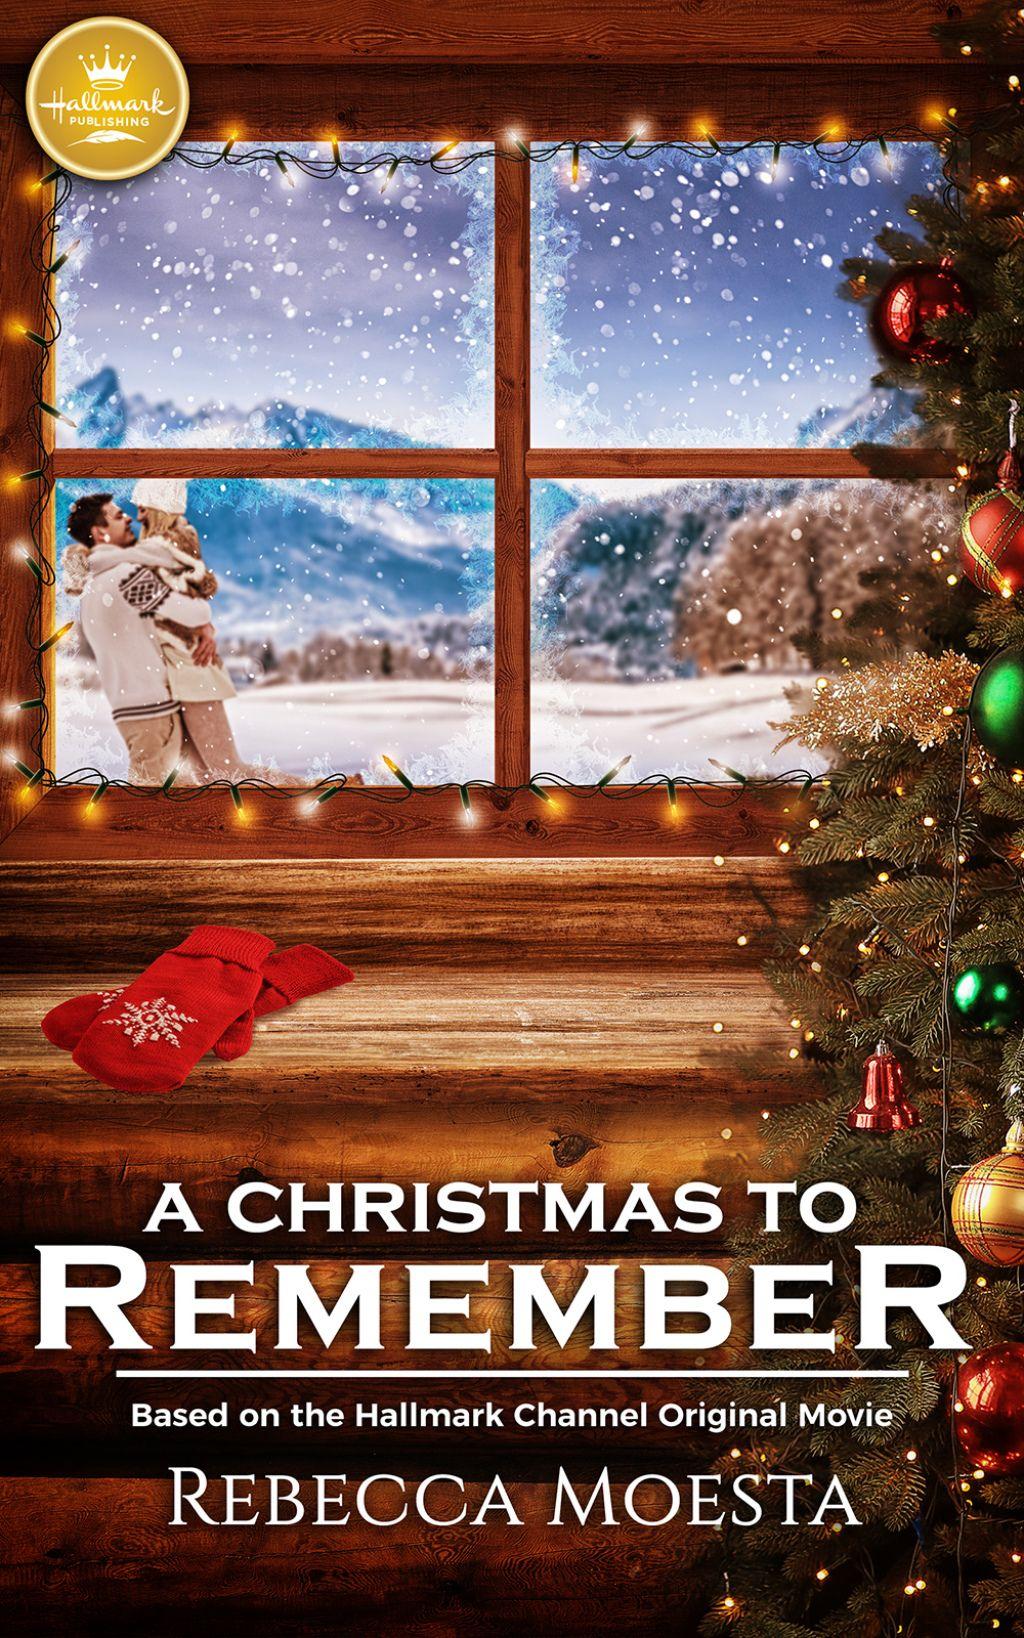 A Christmas To Remember 2019.A Christmas To Remember Ebook In 2019 Hallmark Movies